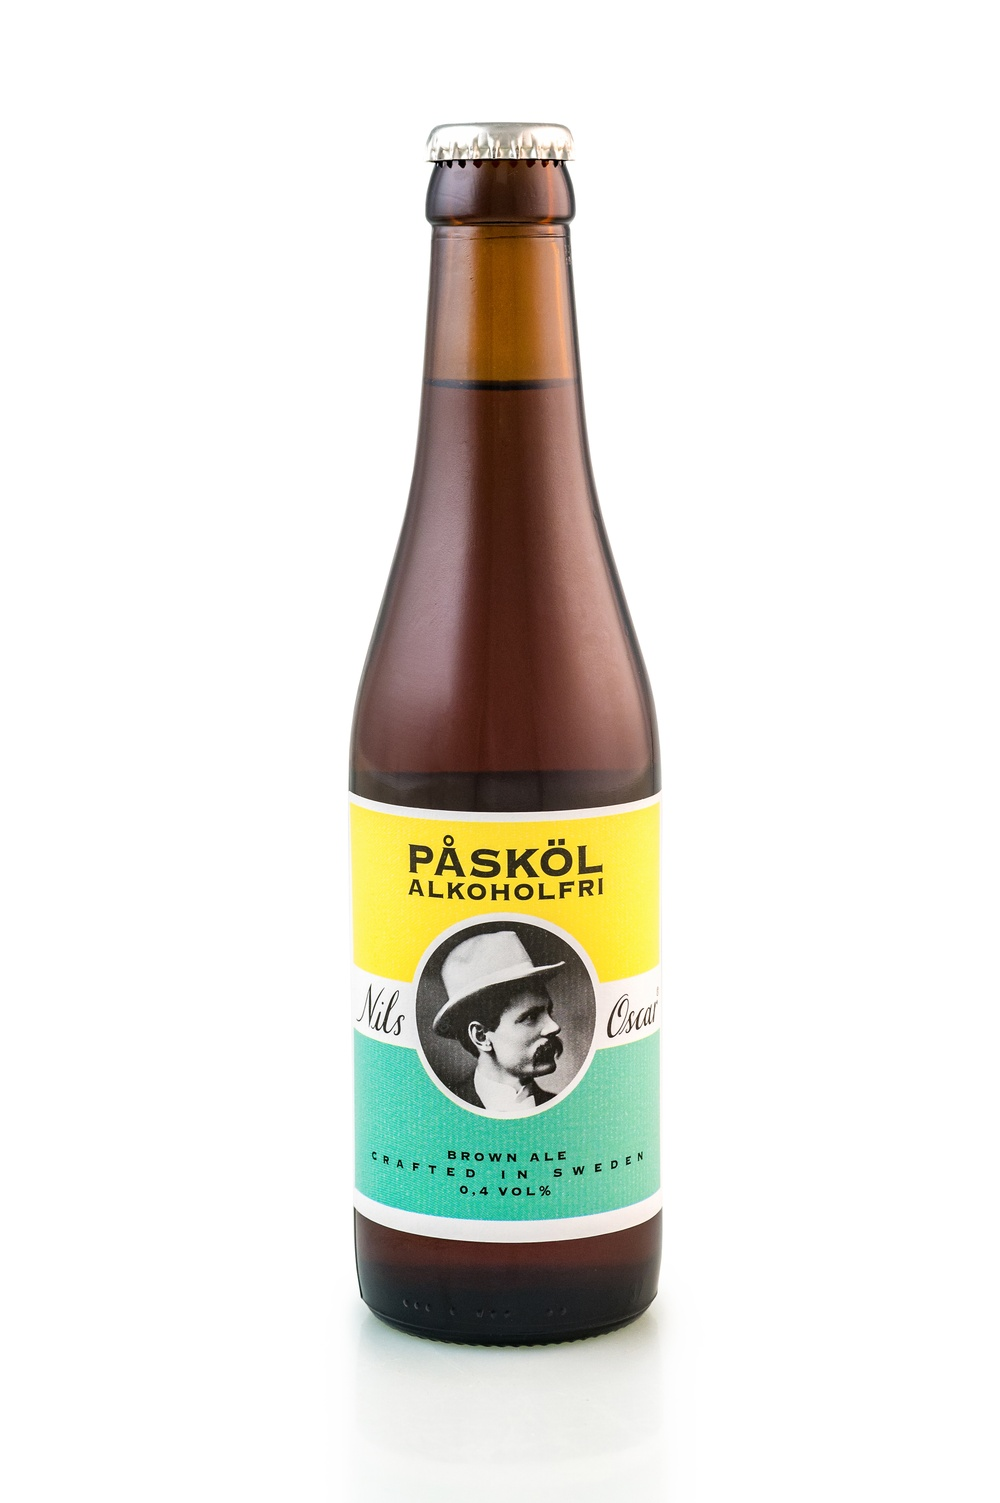 Nils Oscar Alkoholfri Påsköl